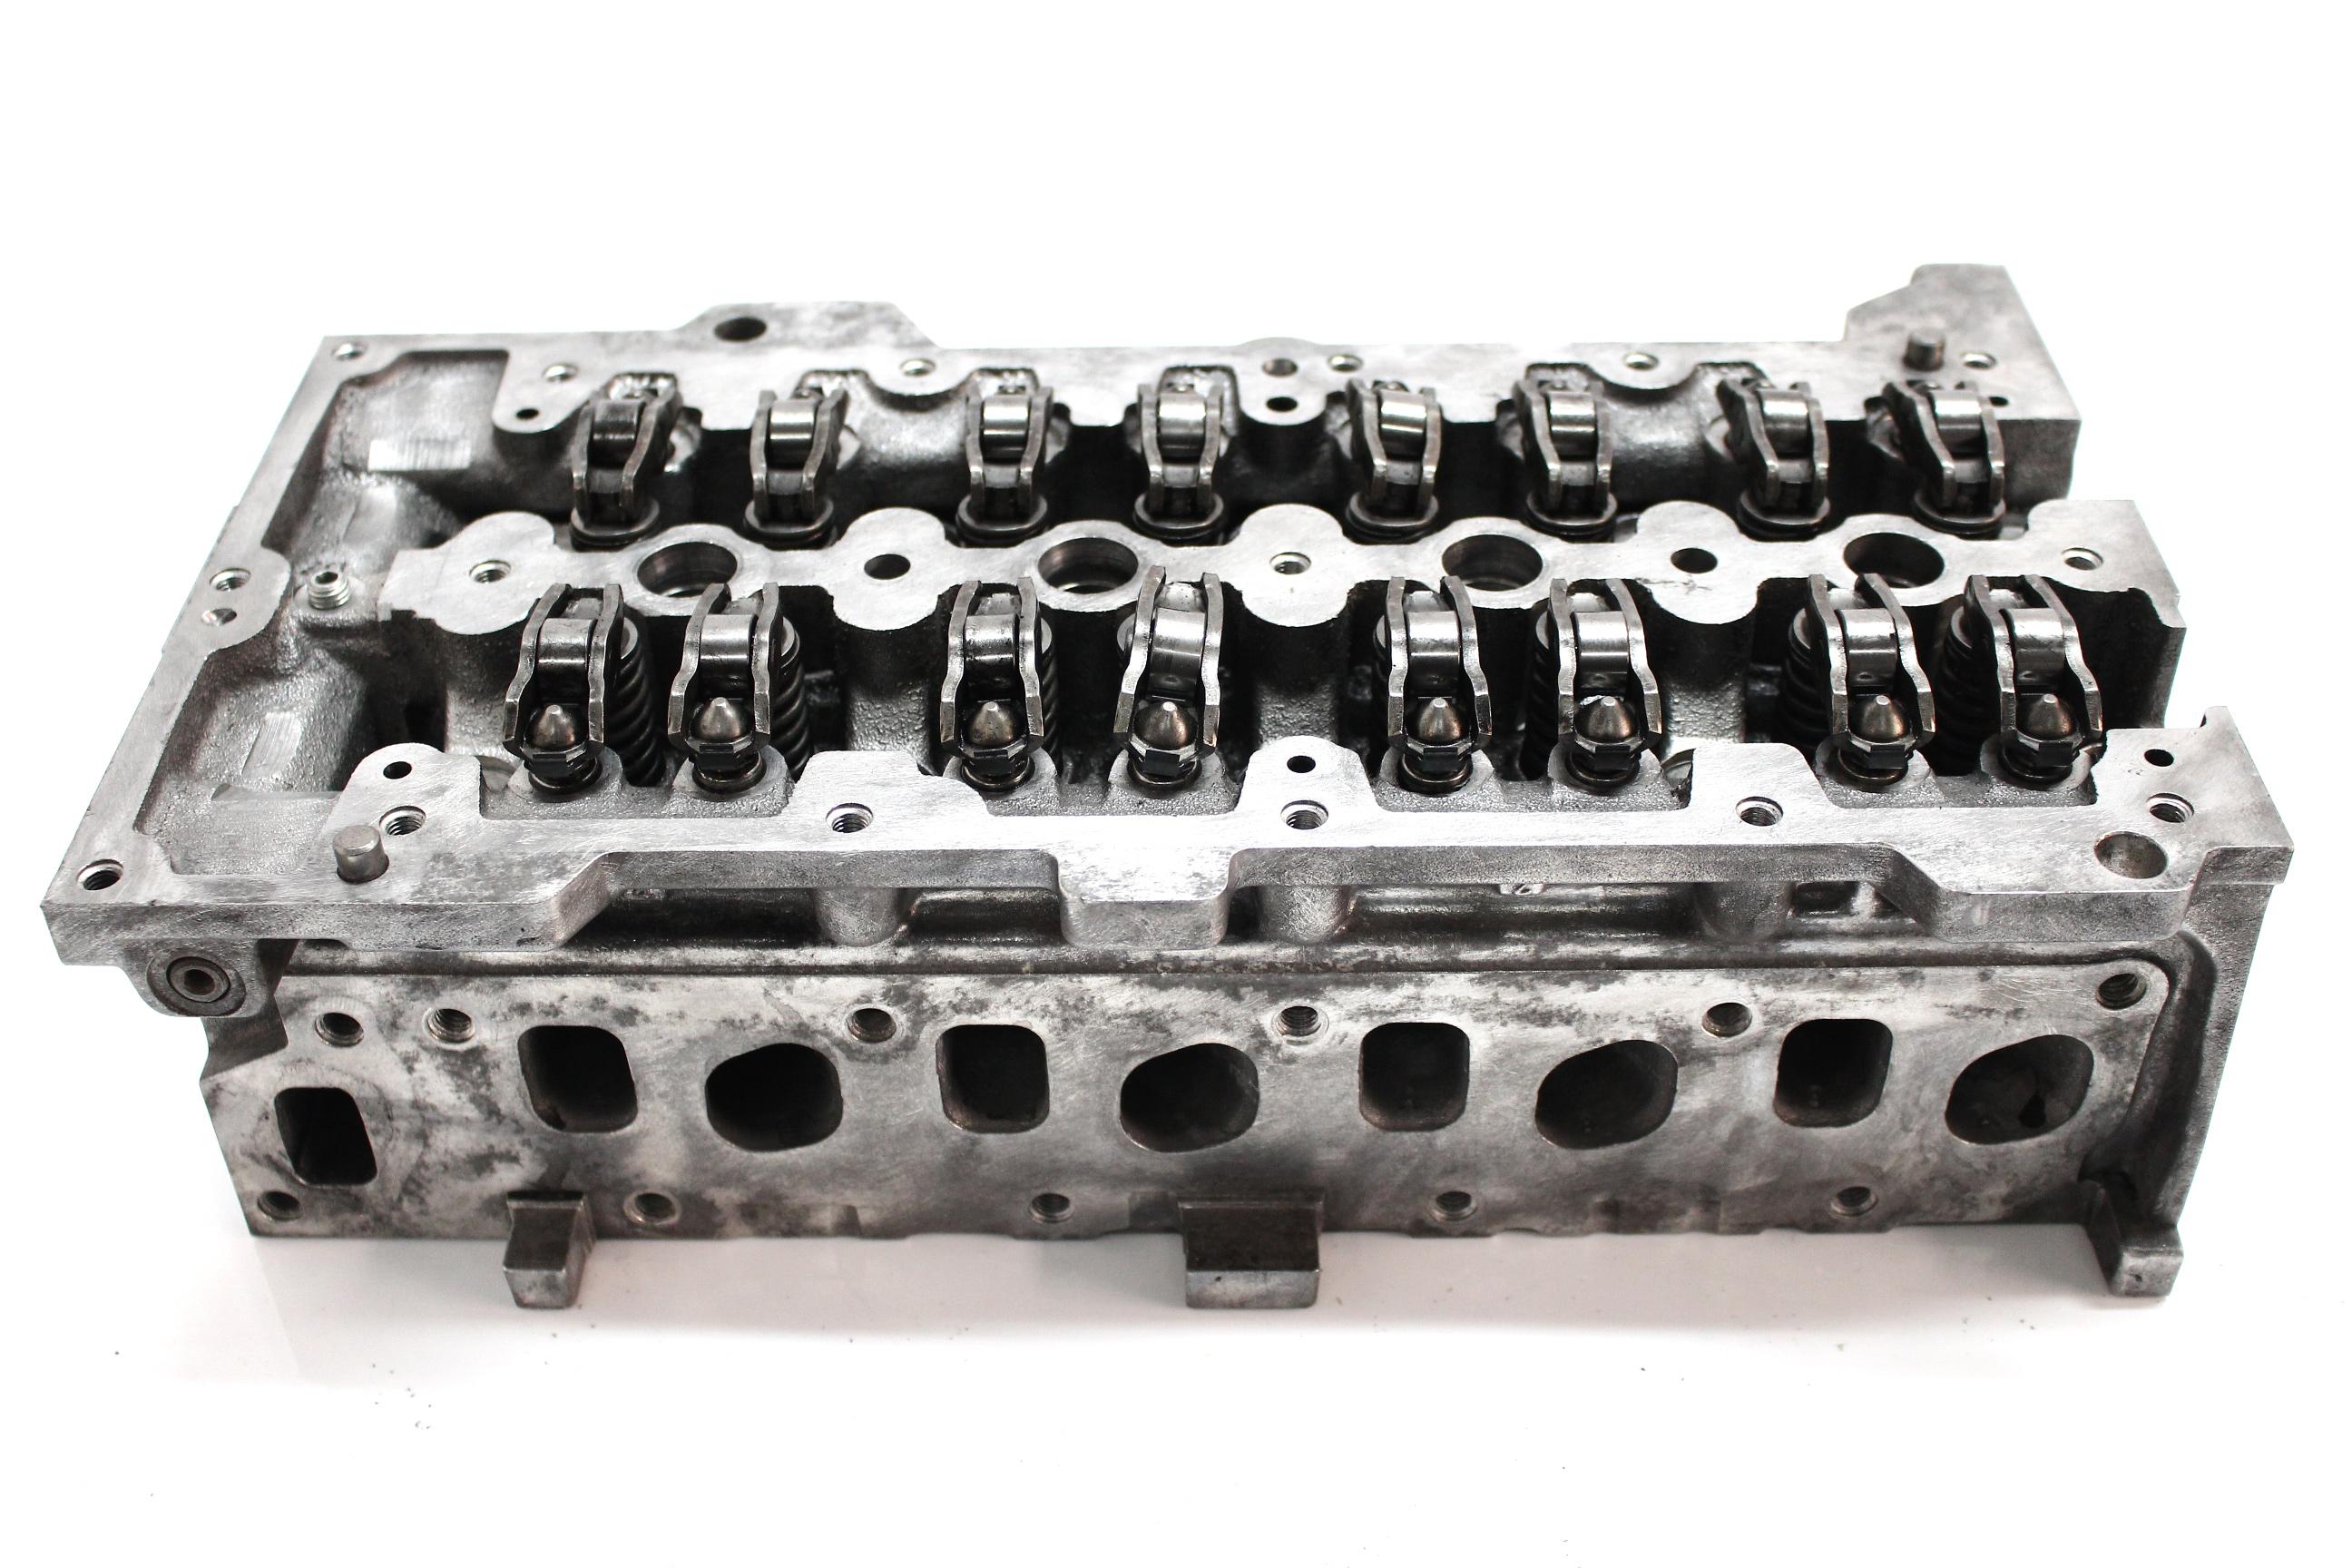 Testa cilindro Fiat, Lancia, Opel, Suzuki 1,3 D 188A4000 Y13DT Z13DT Z13DTJ Z13DTH